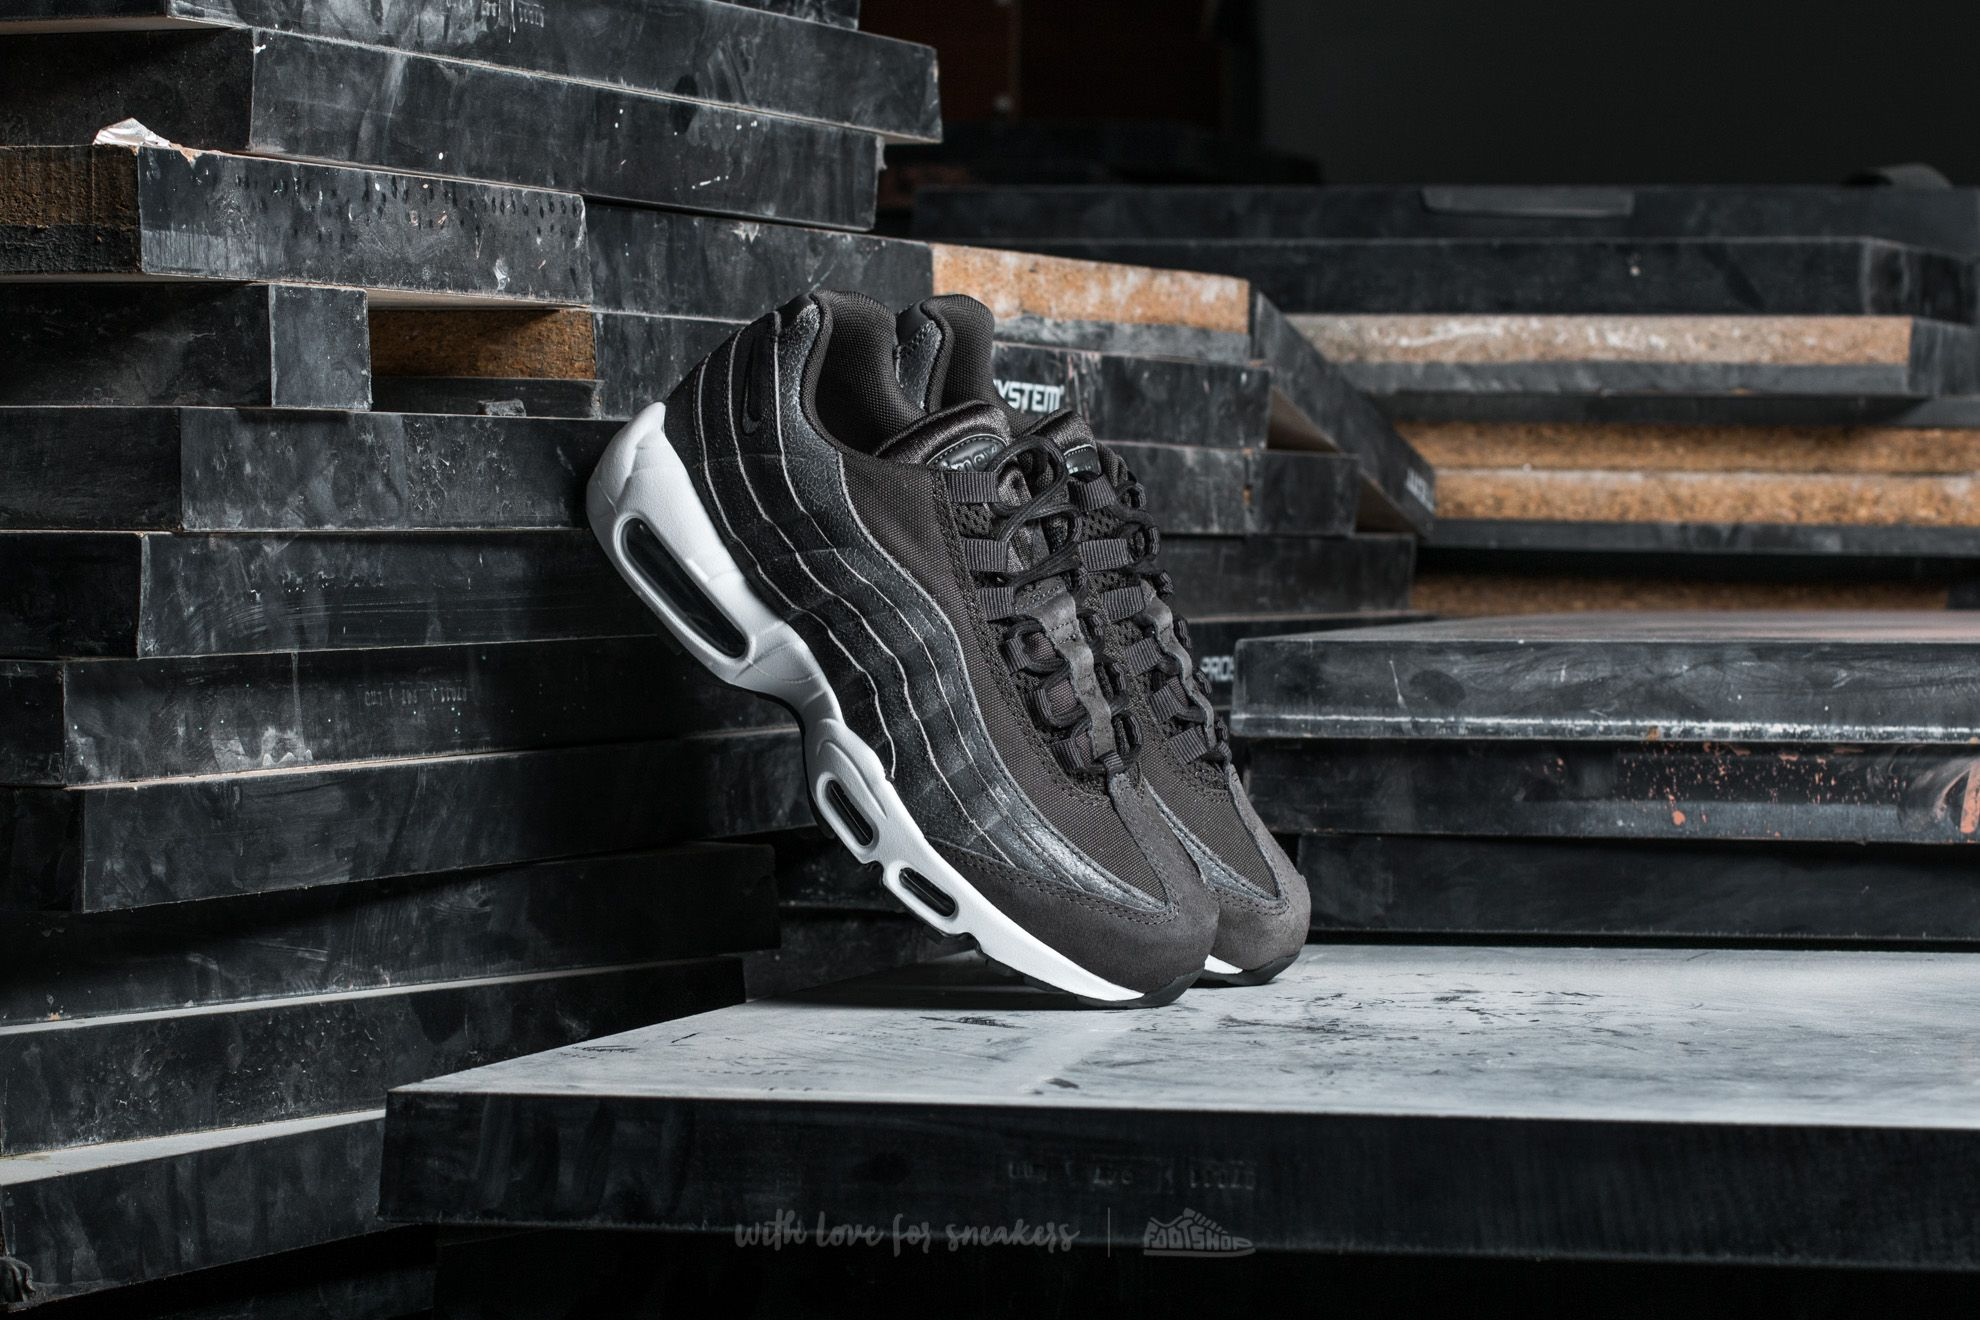 Nike Wmns Air Max 95 Premium Midnight Fog Midnight Fog | Footshop